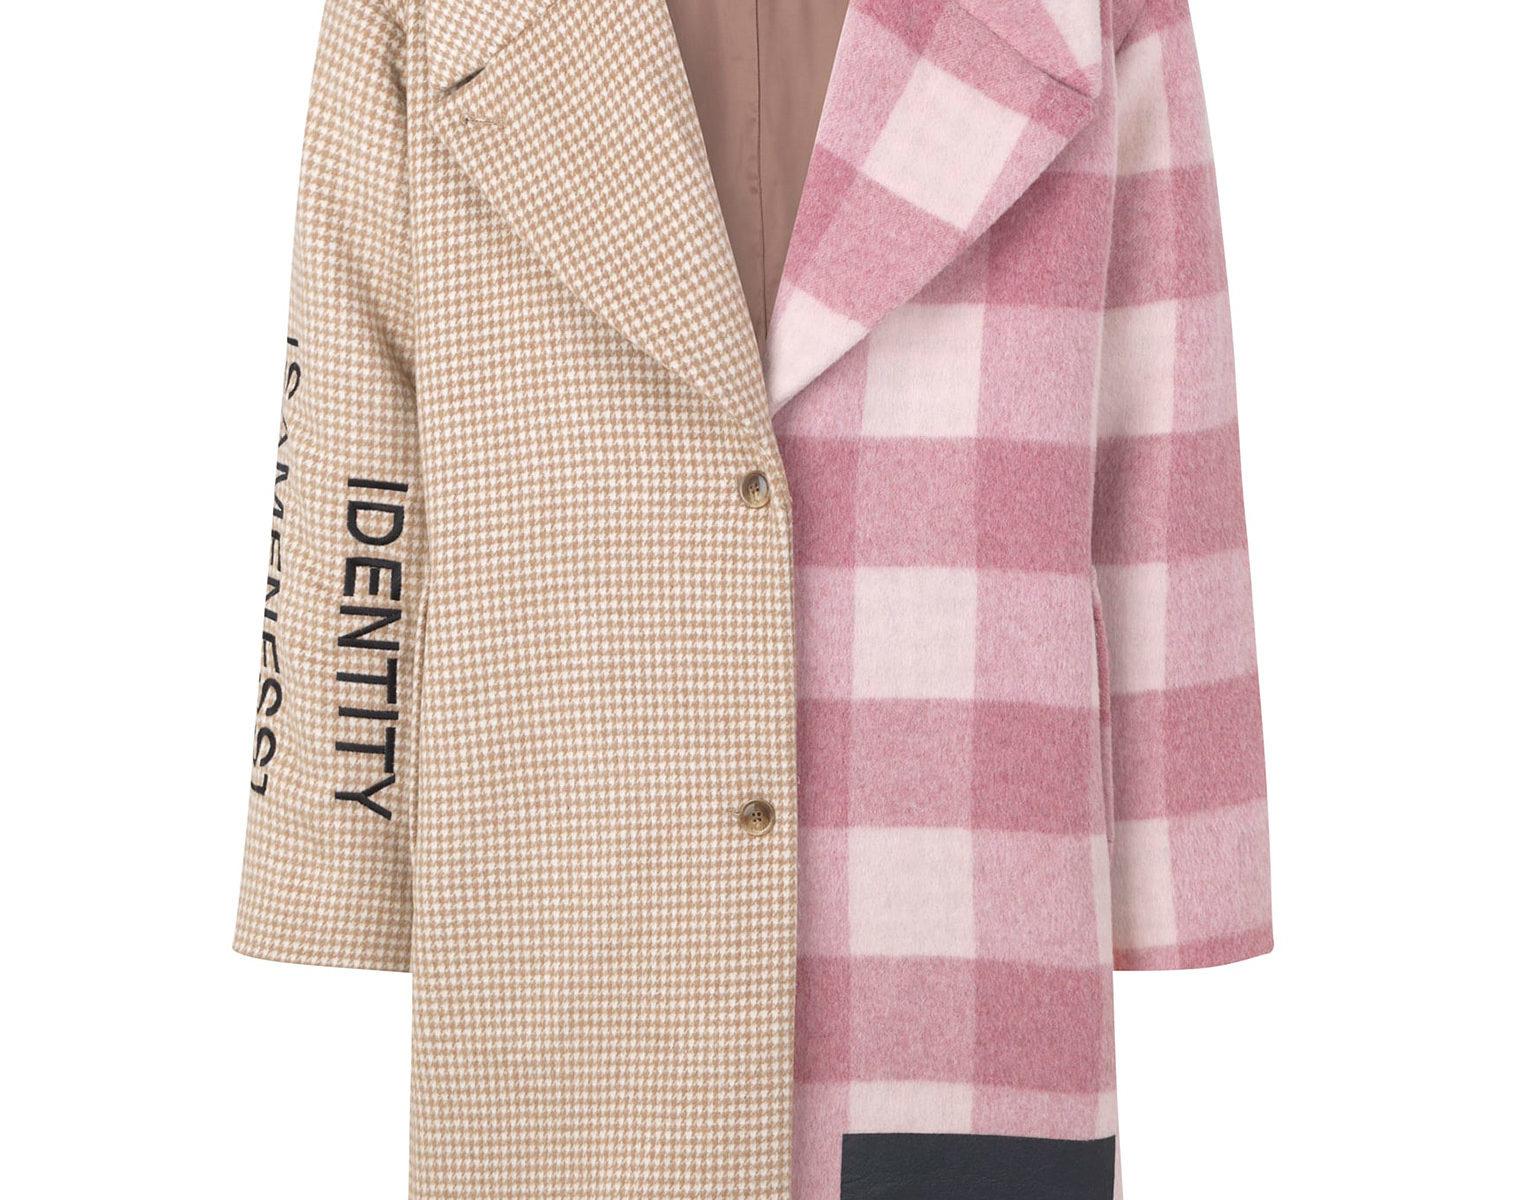 MUF10 Coat ID 2WAY 1